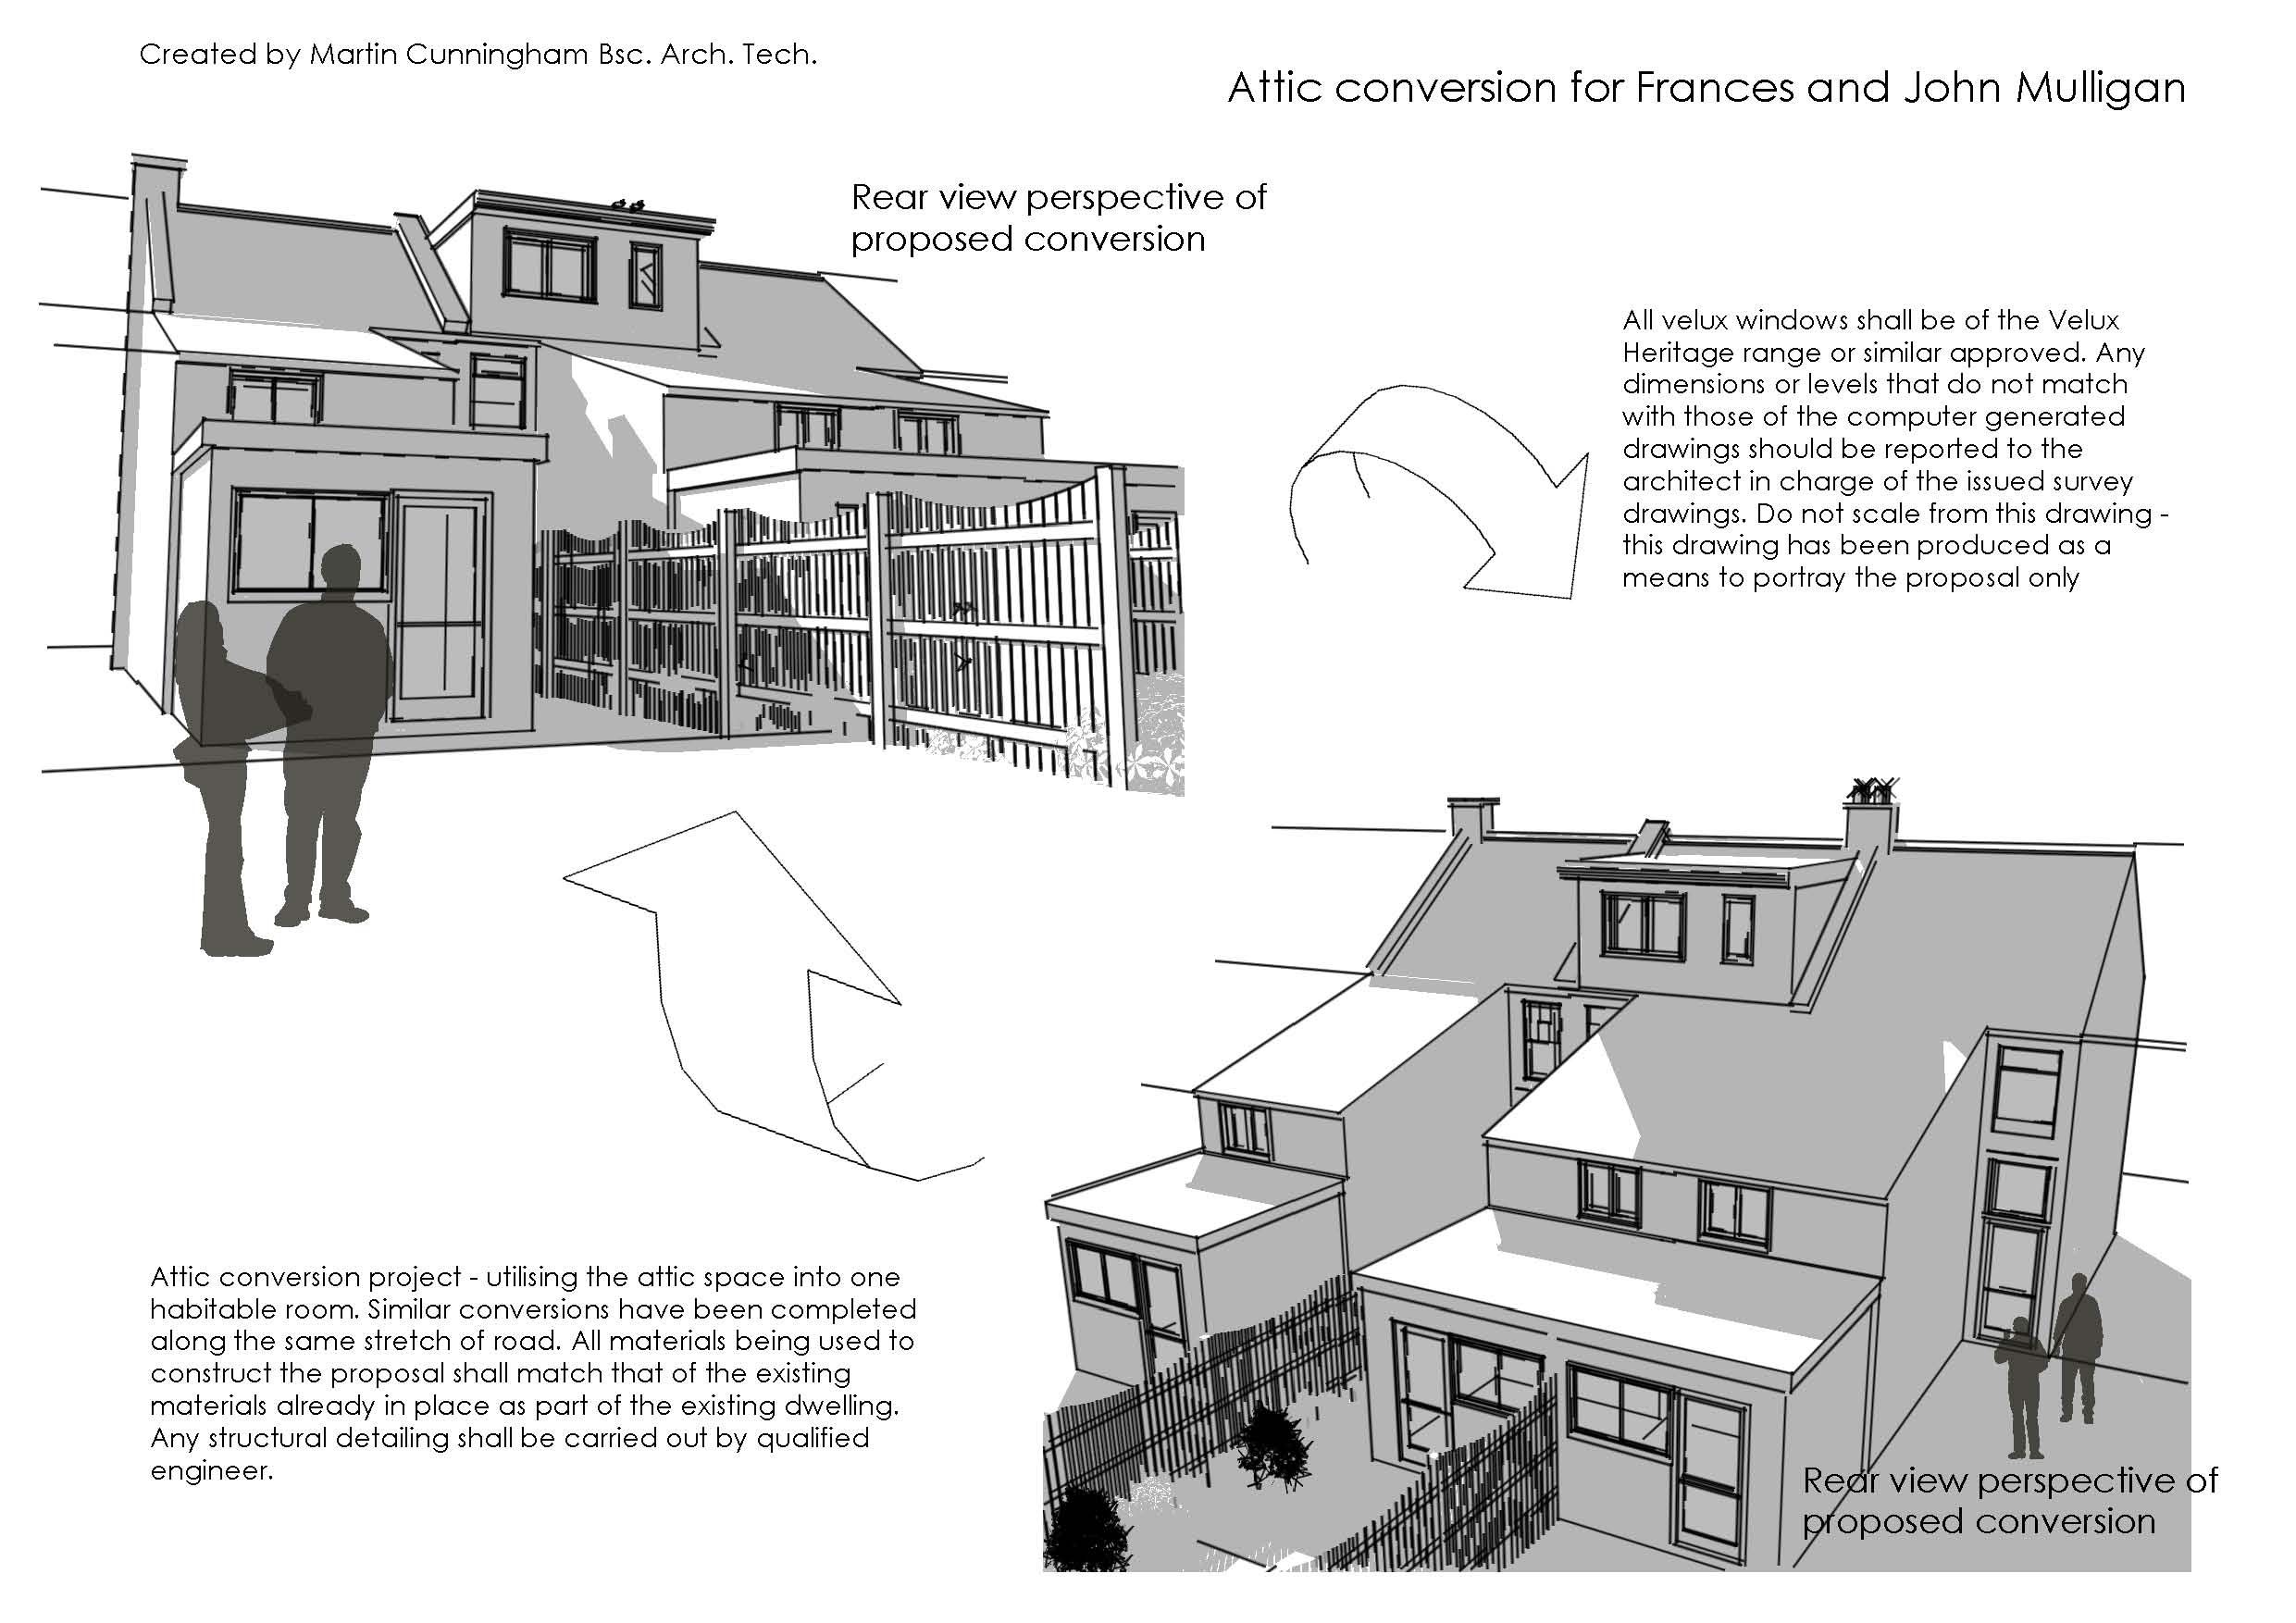 sketchup by martin cunningham at Coroflot.com